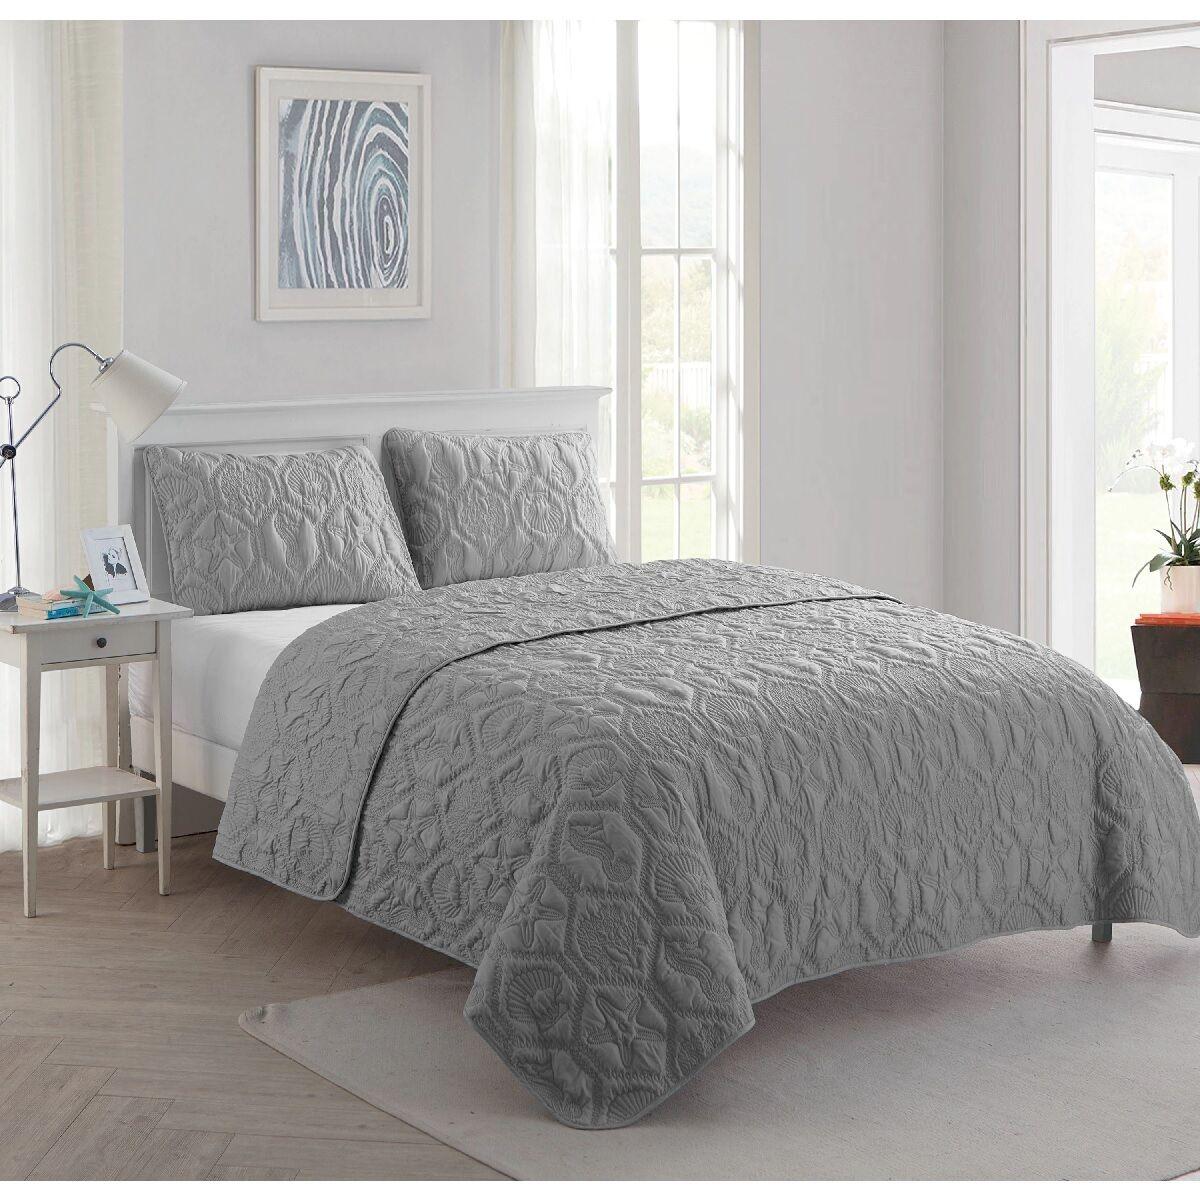 Coastal Quilt Set King Gray Bed Comforter Cover Beach Ocean